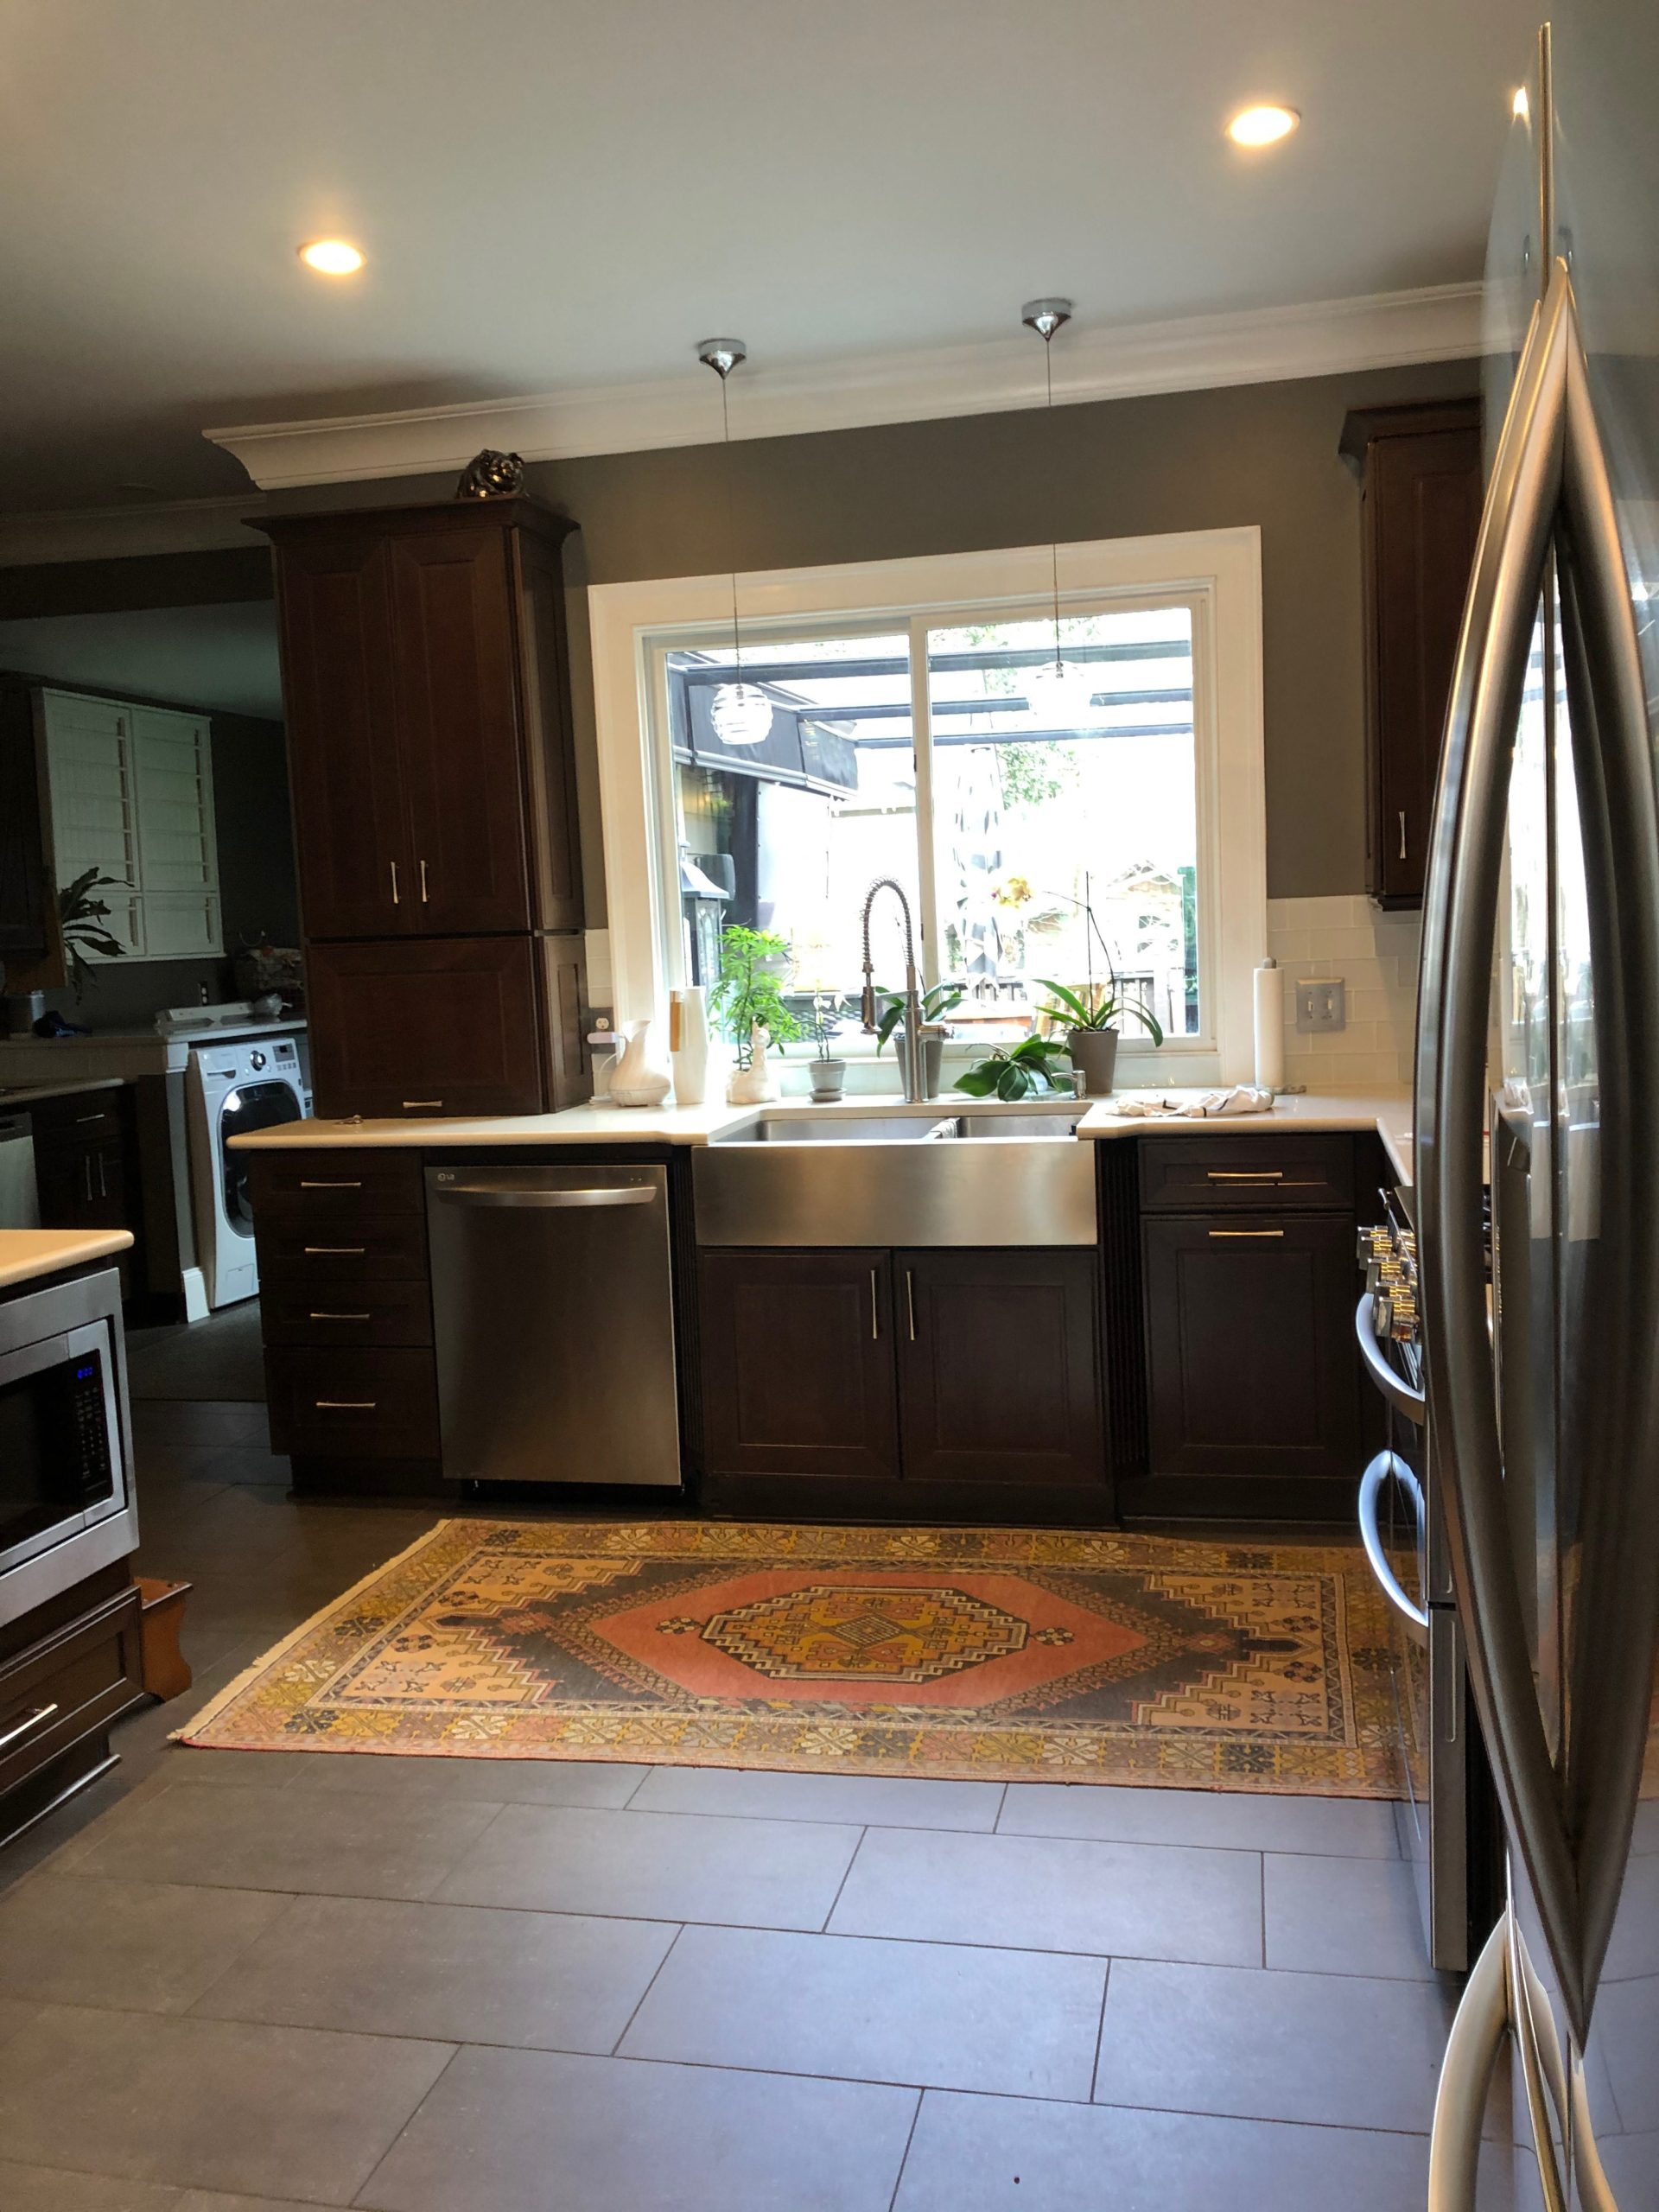 Finished kitchen remodel in Sandy Springs GA